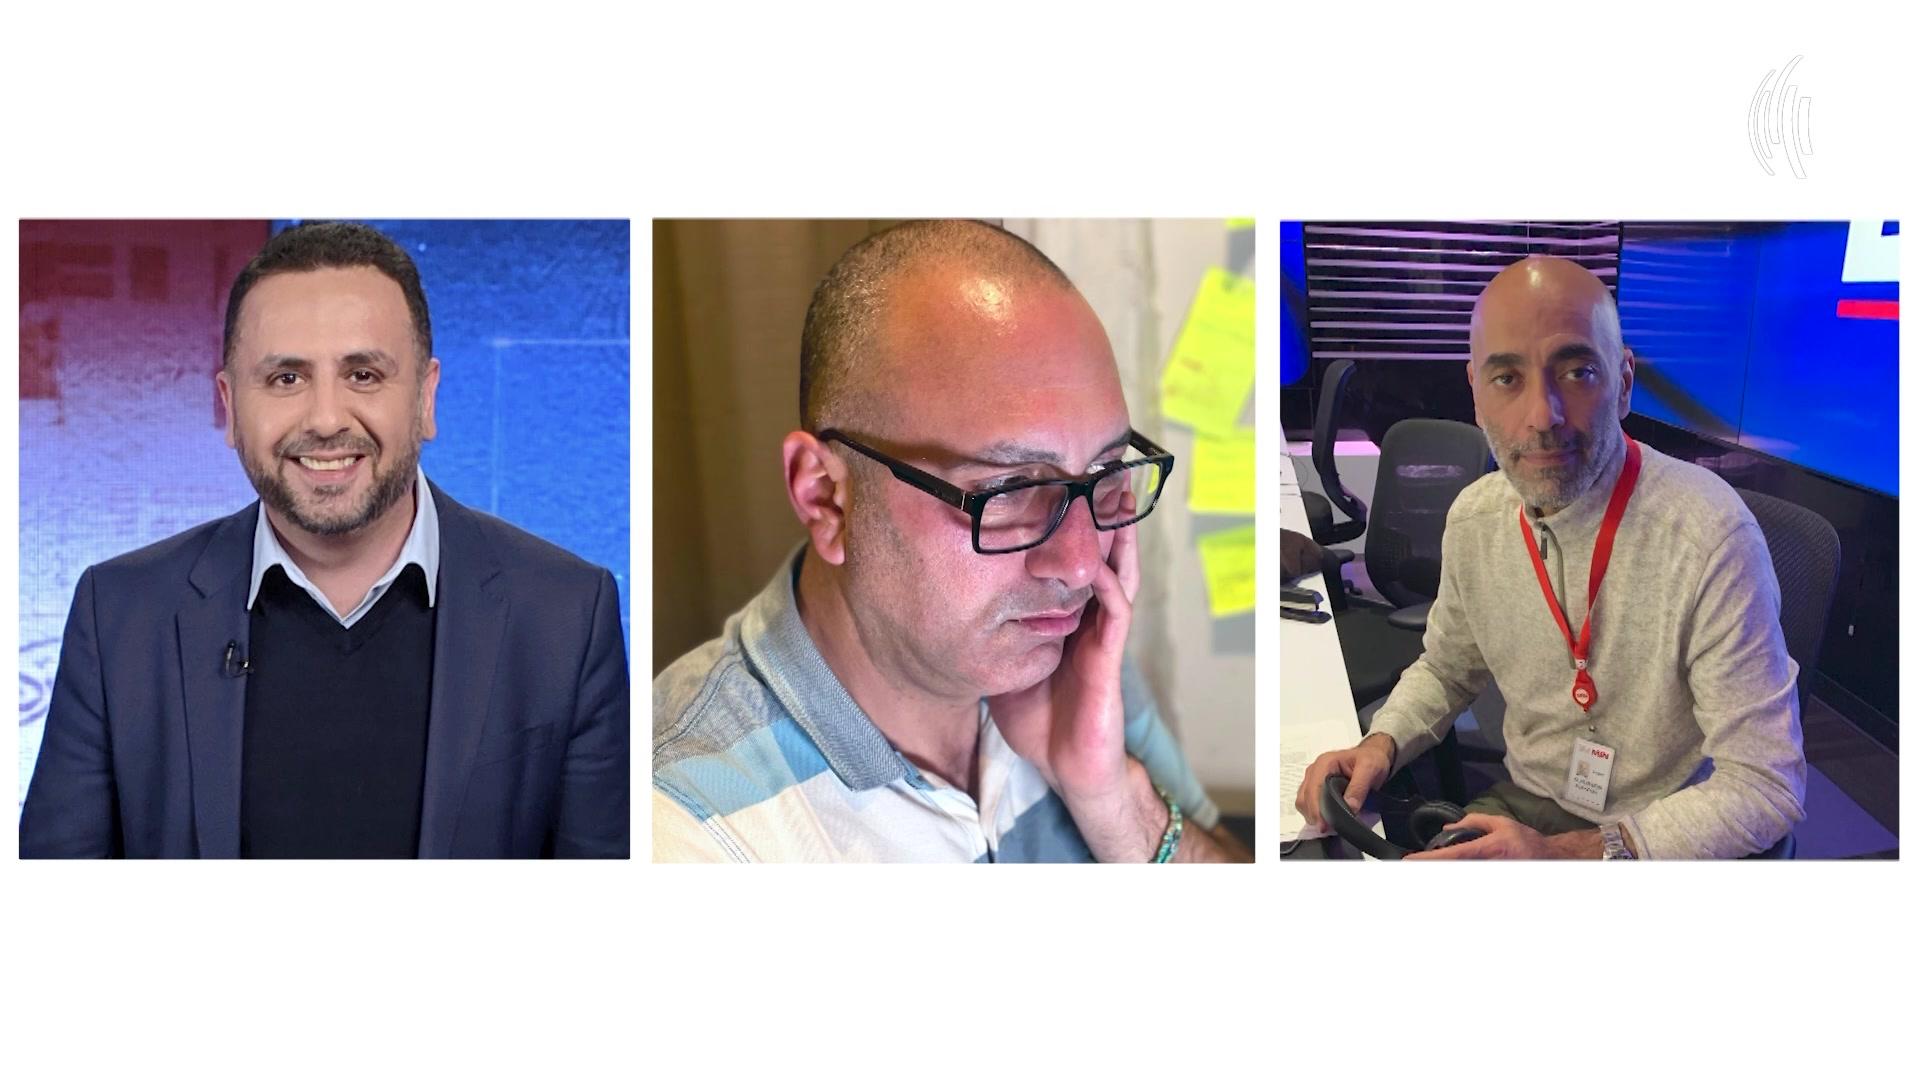 Maan Aljizzani, Omar Al Humairi, and Alhussein Elrazzaz